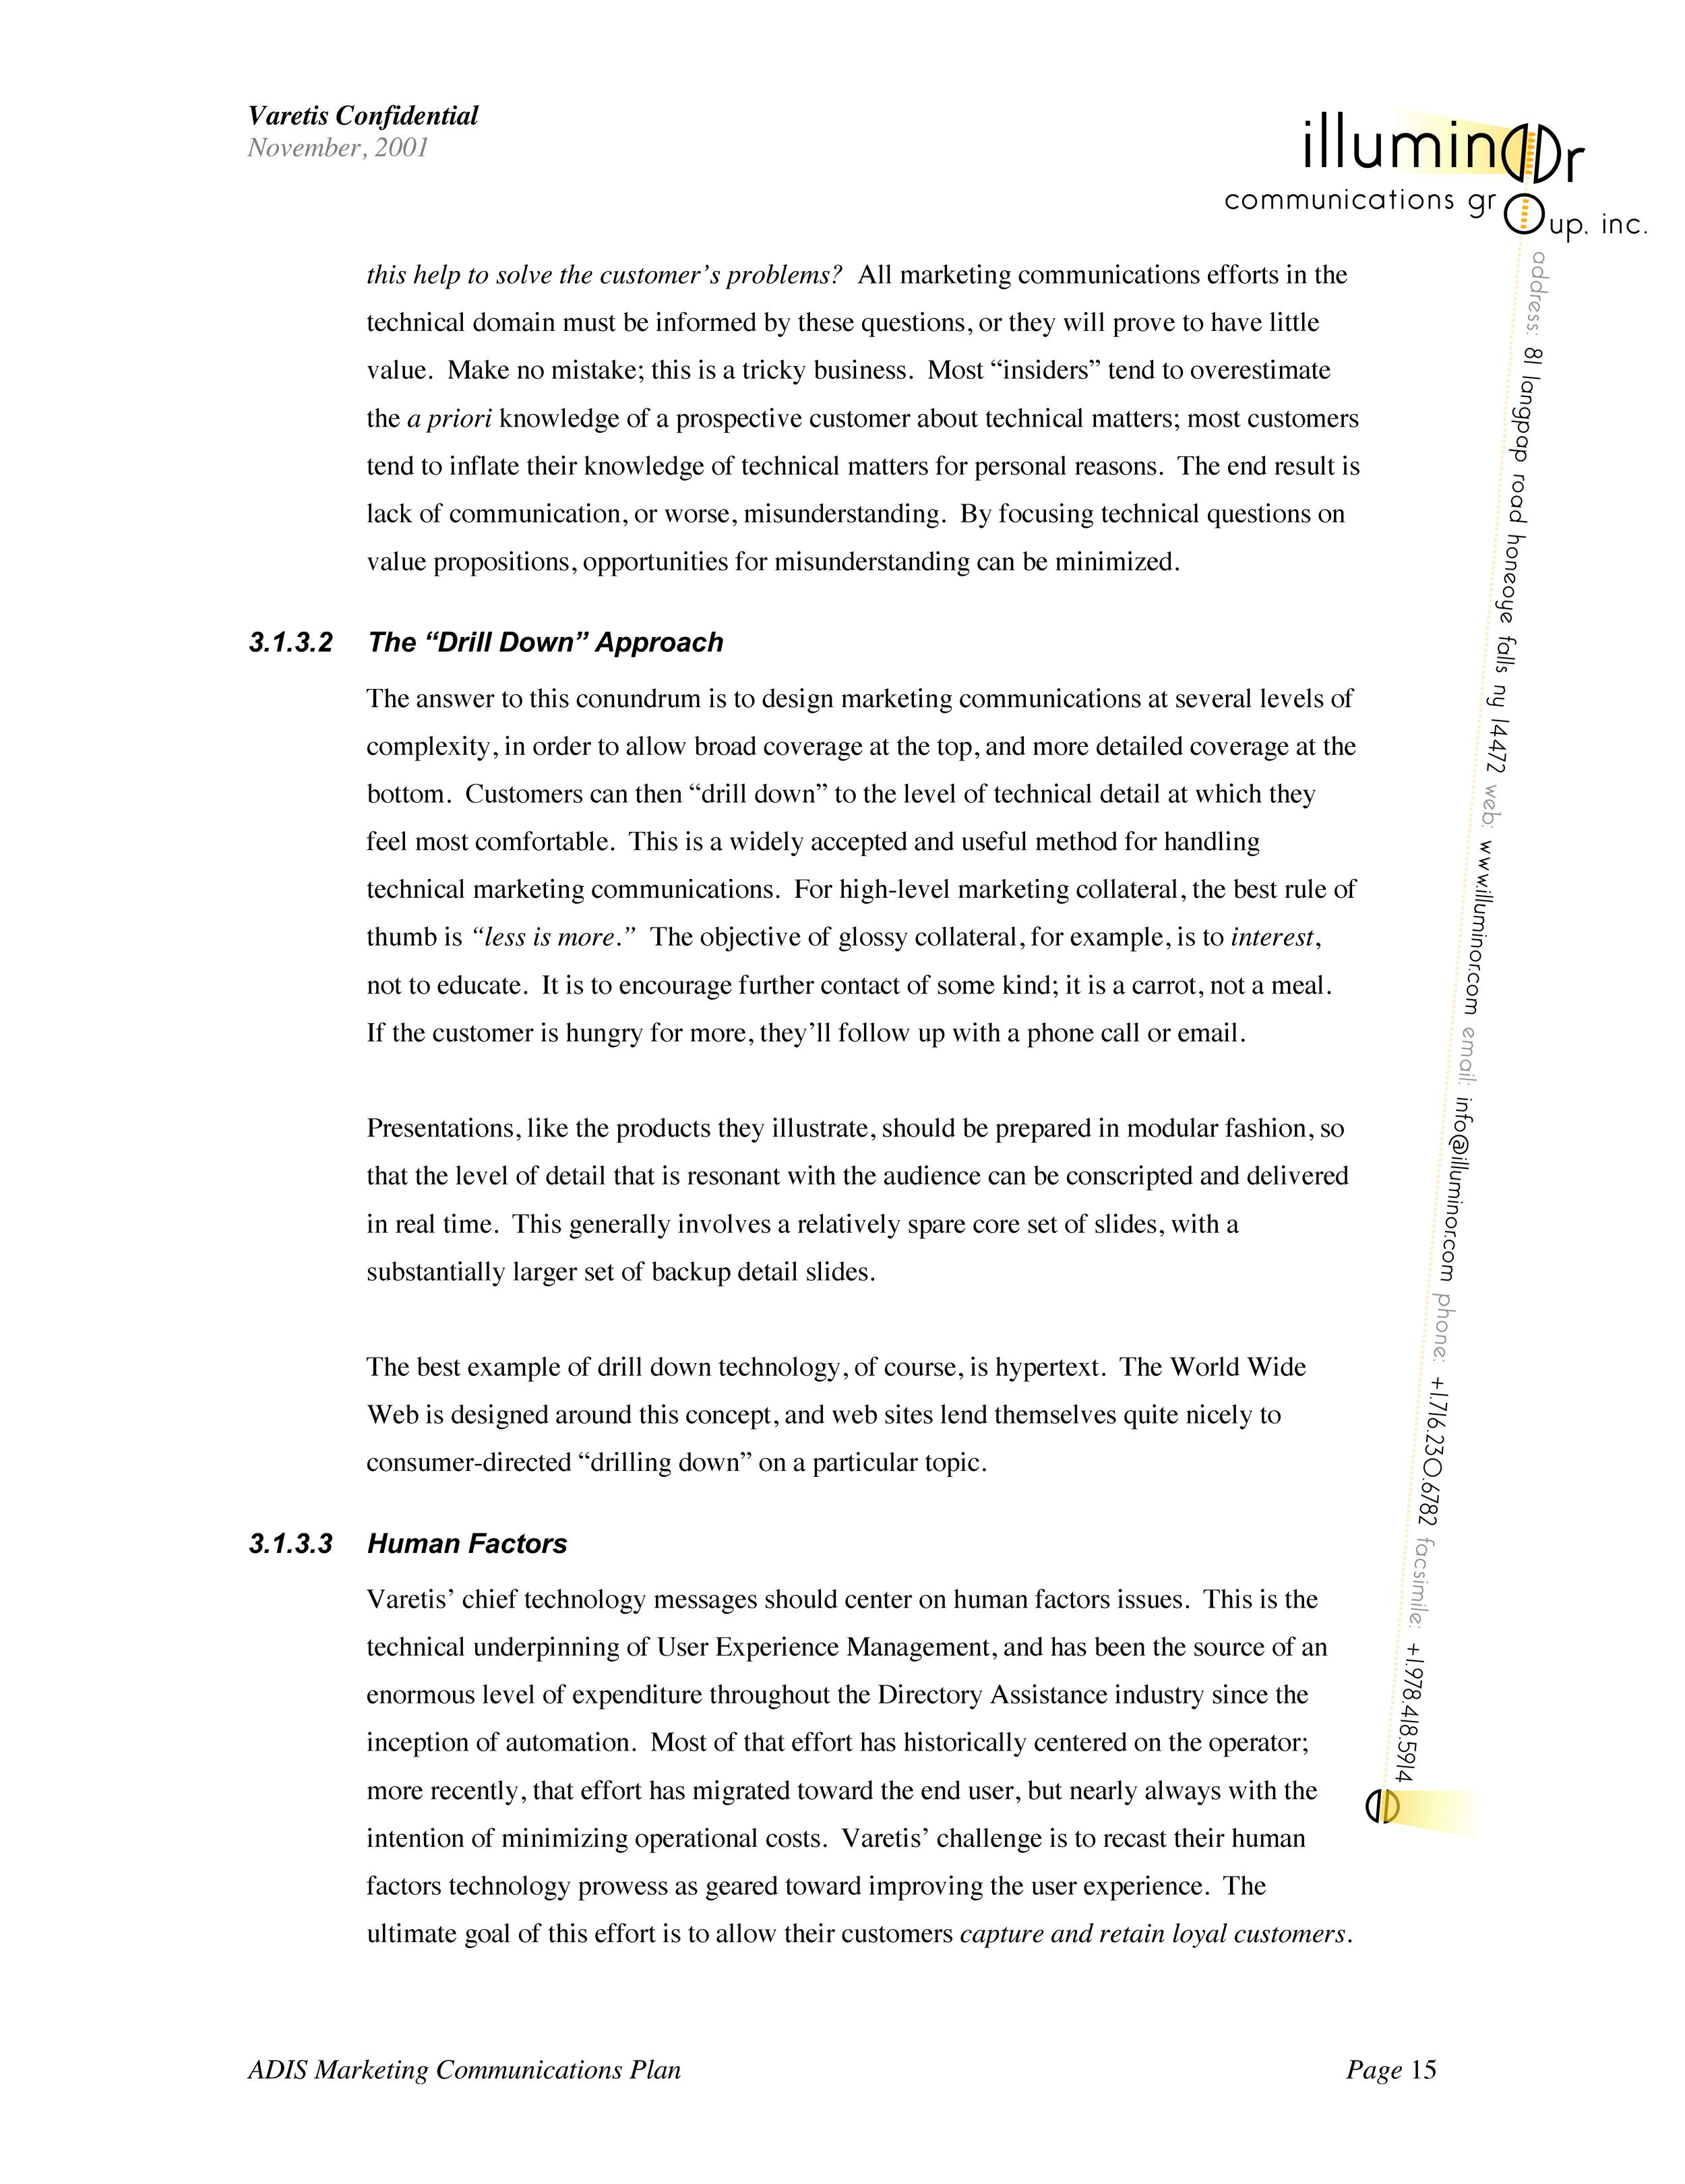 ADIS Marcomm Plan_Page_15.png